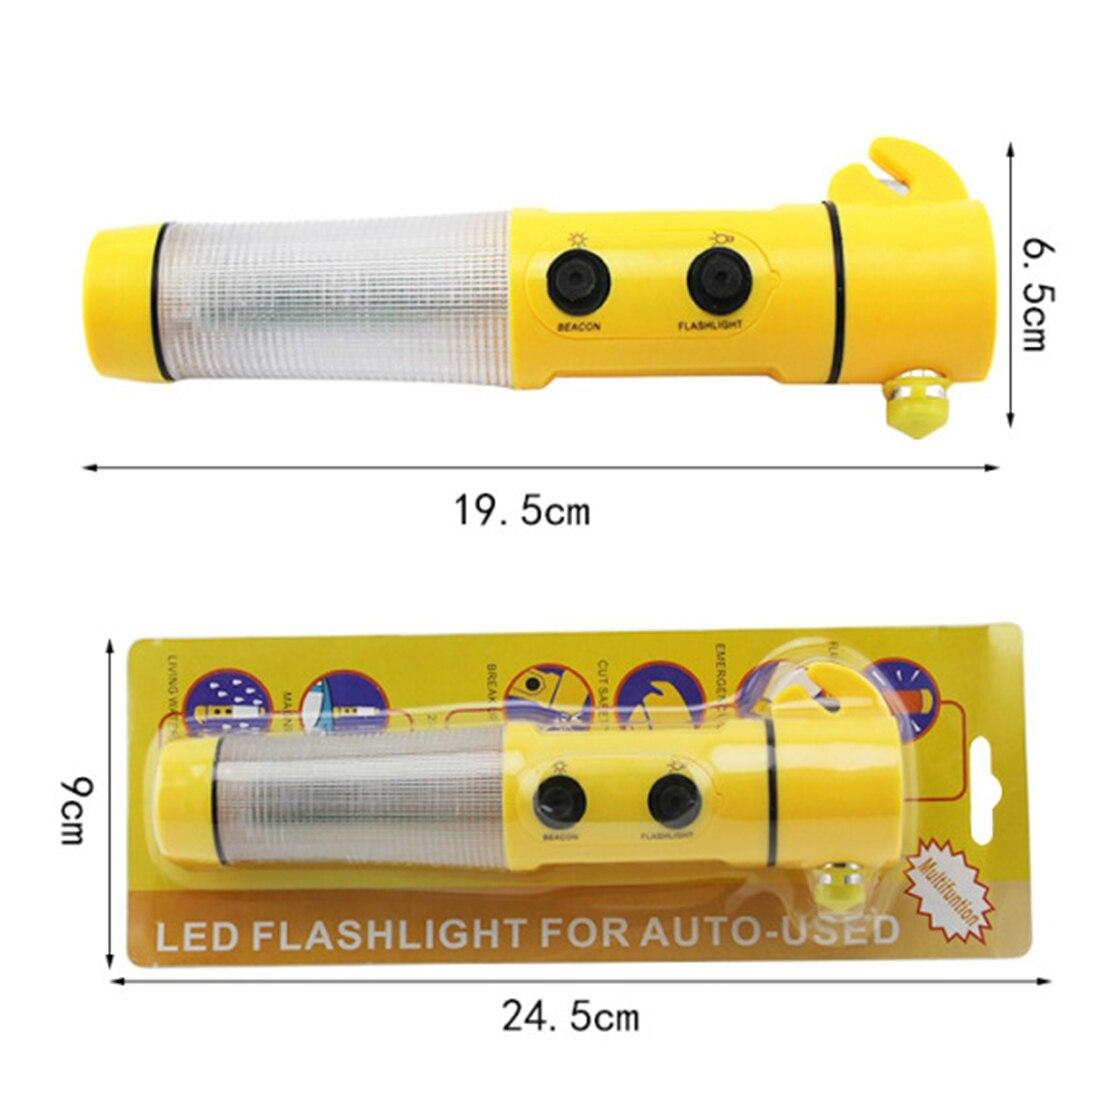 Yellow Mini Safety Hammer Life Saving Escape Emergency Hammer 4 In 1 Seat Belt Cutter Car Glass Window Breaker Rescue Hammer Too